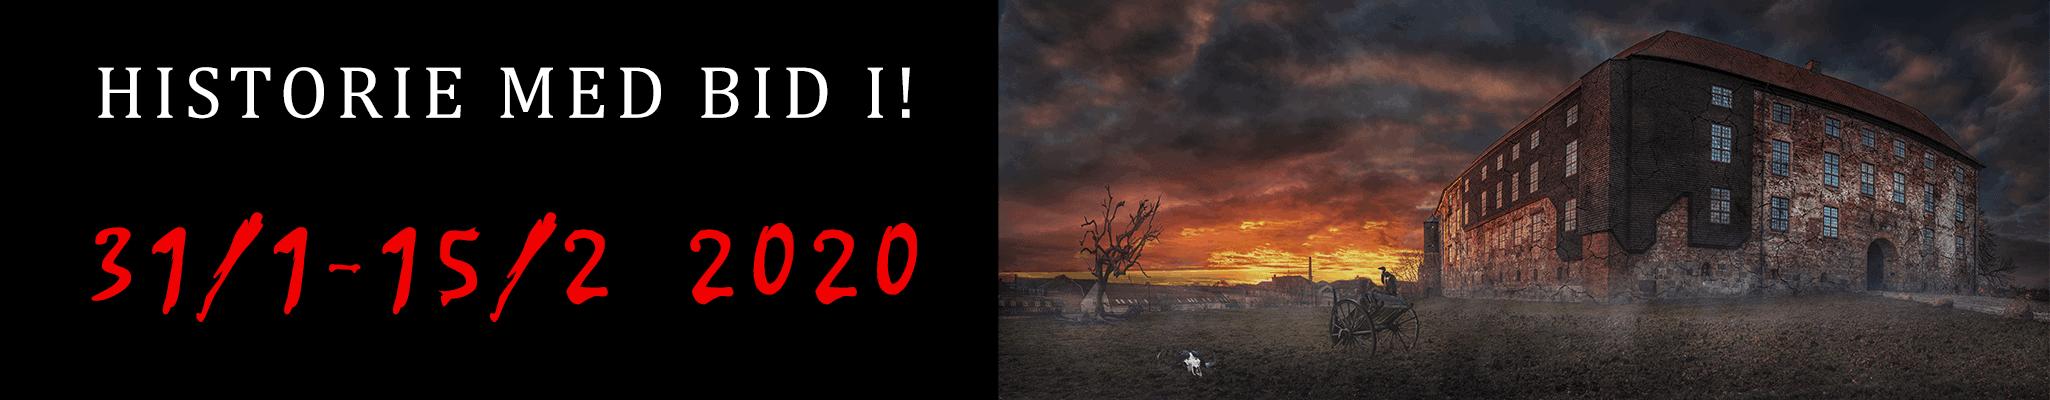 Haunted Castle 2020 The Curse of the Blood Koldinghus